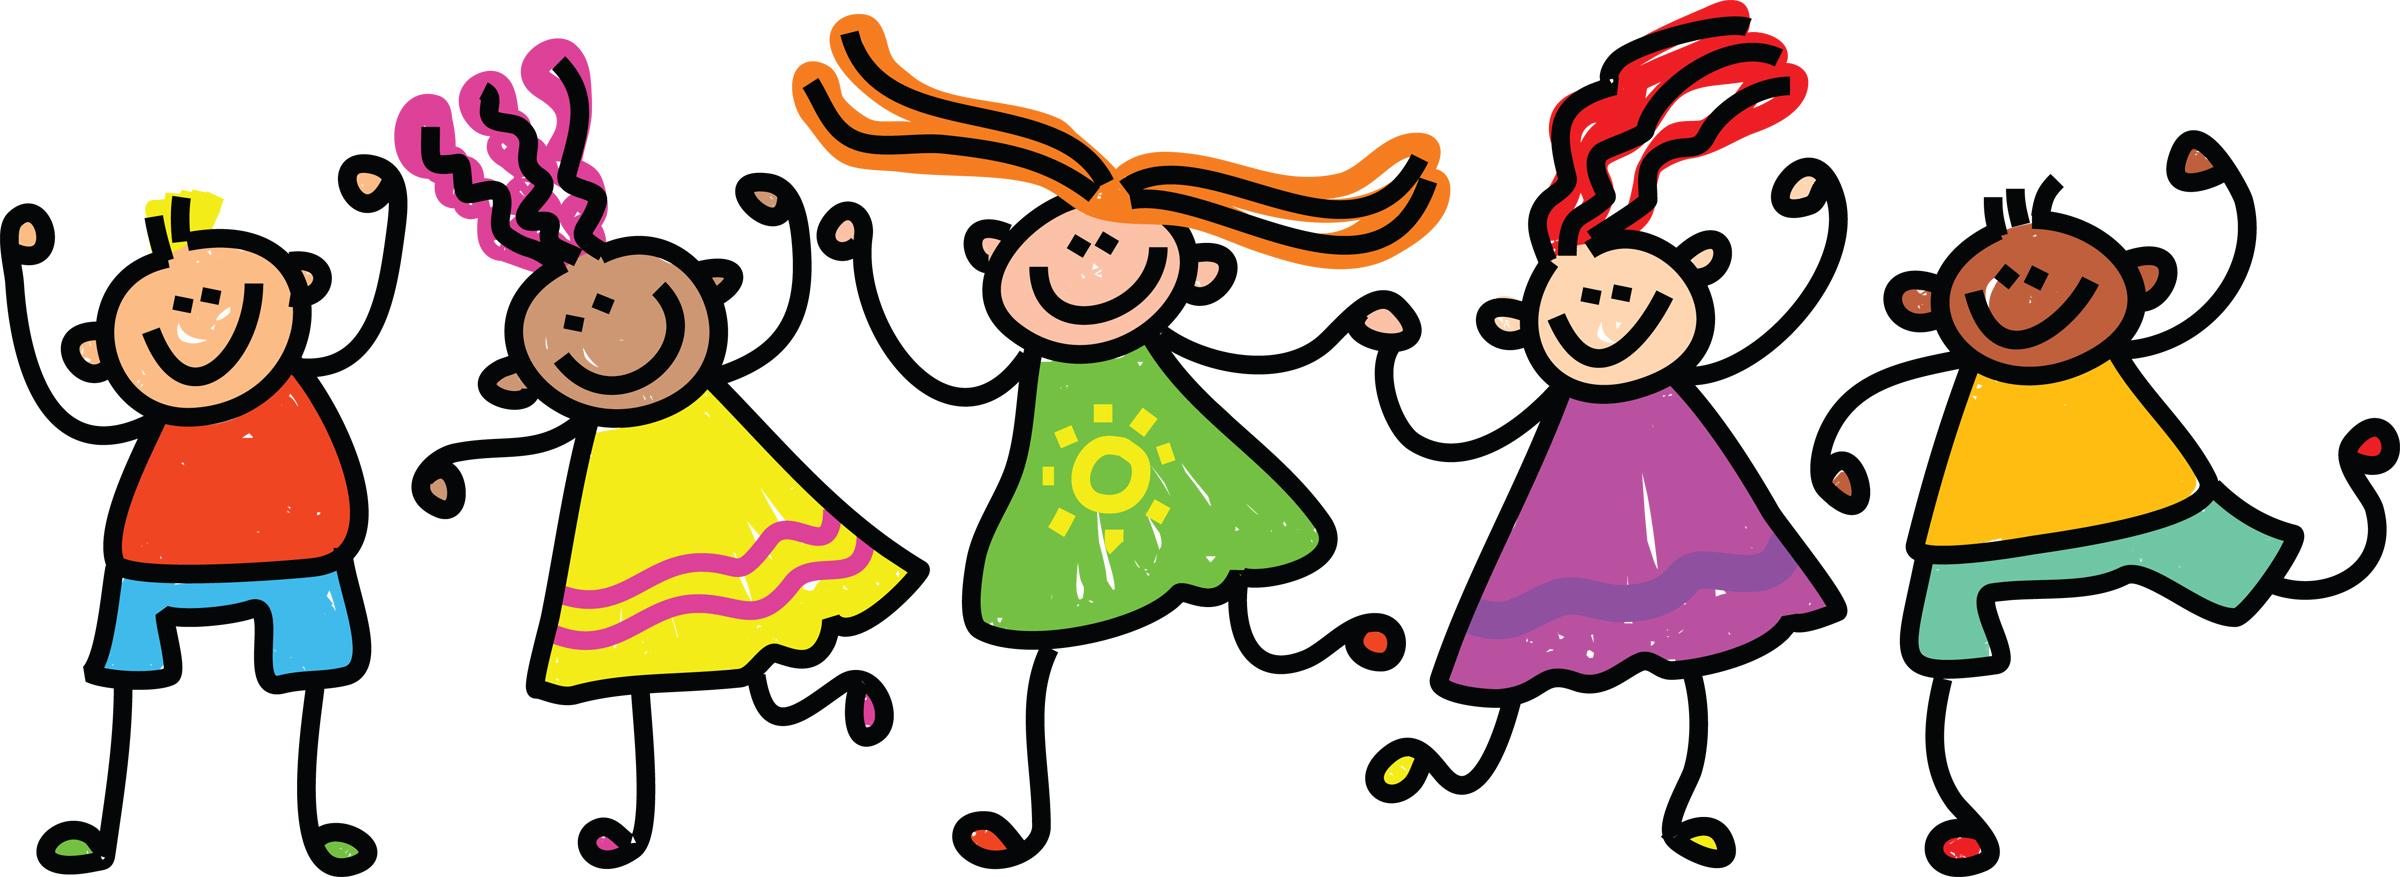 Happy Kids Clipart Black And White | Cli-Happy Kids Clipart Black And White | Clipart library - Free Clipart-9